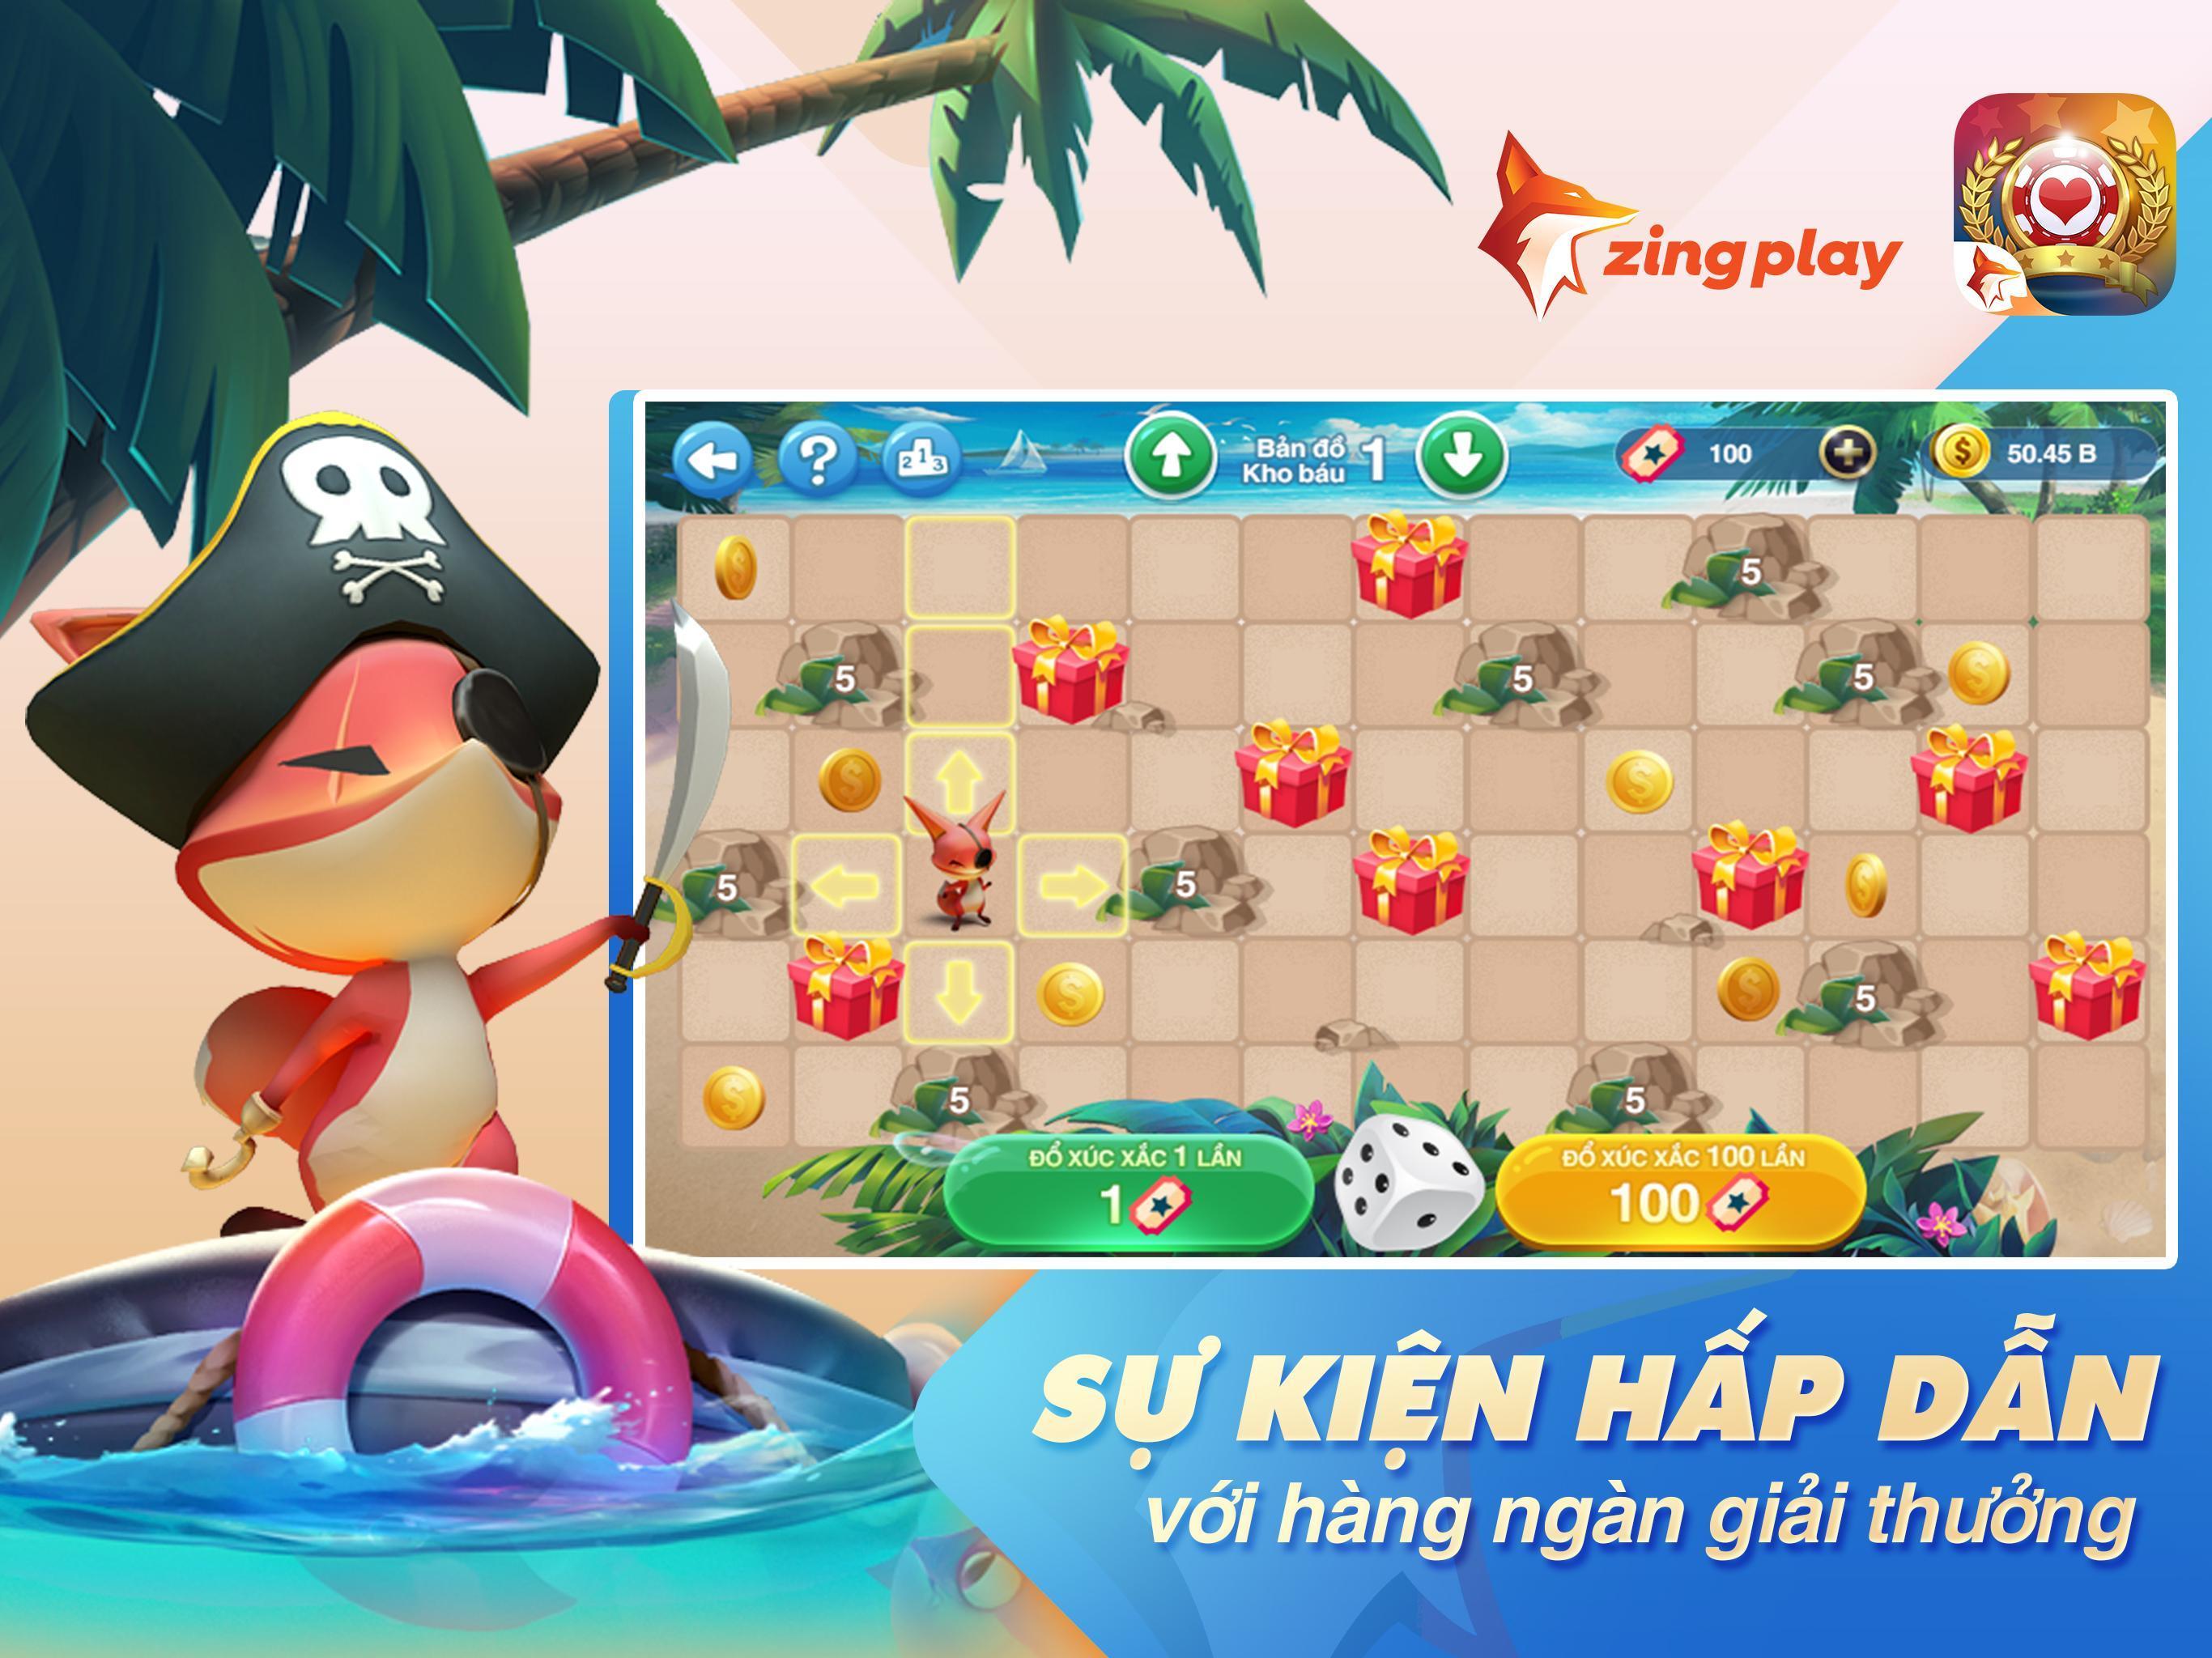 Tiến Len Miền Nam Tiến Len Tien Len Zingplay For Android Apk Download